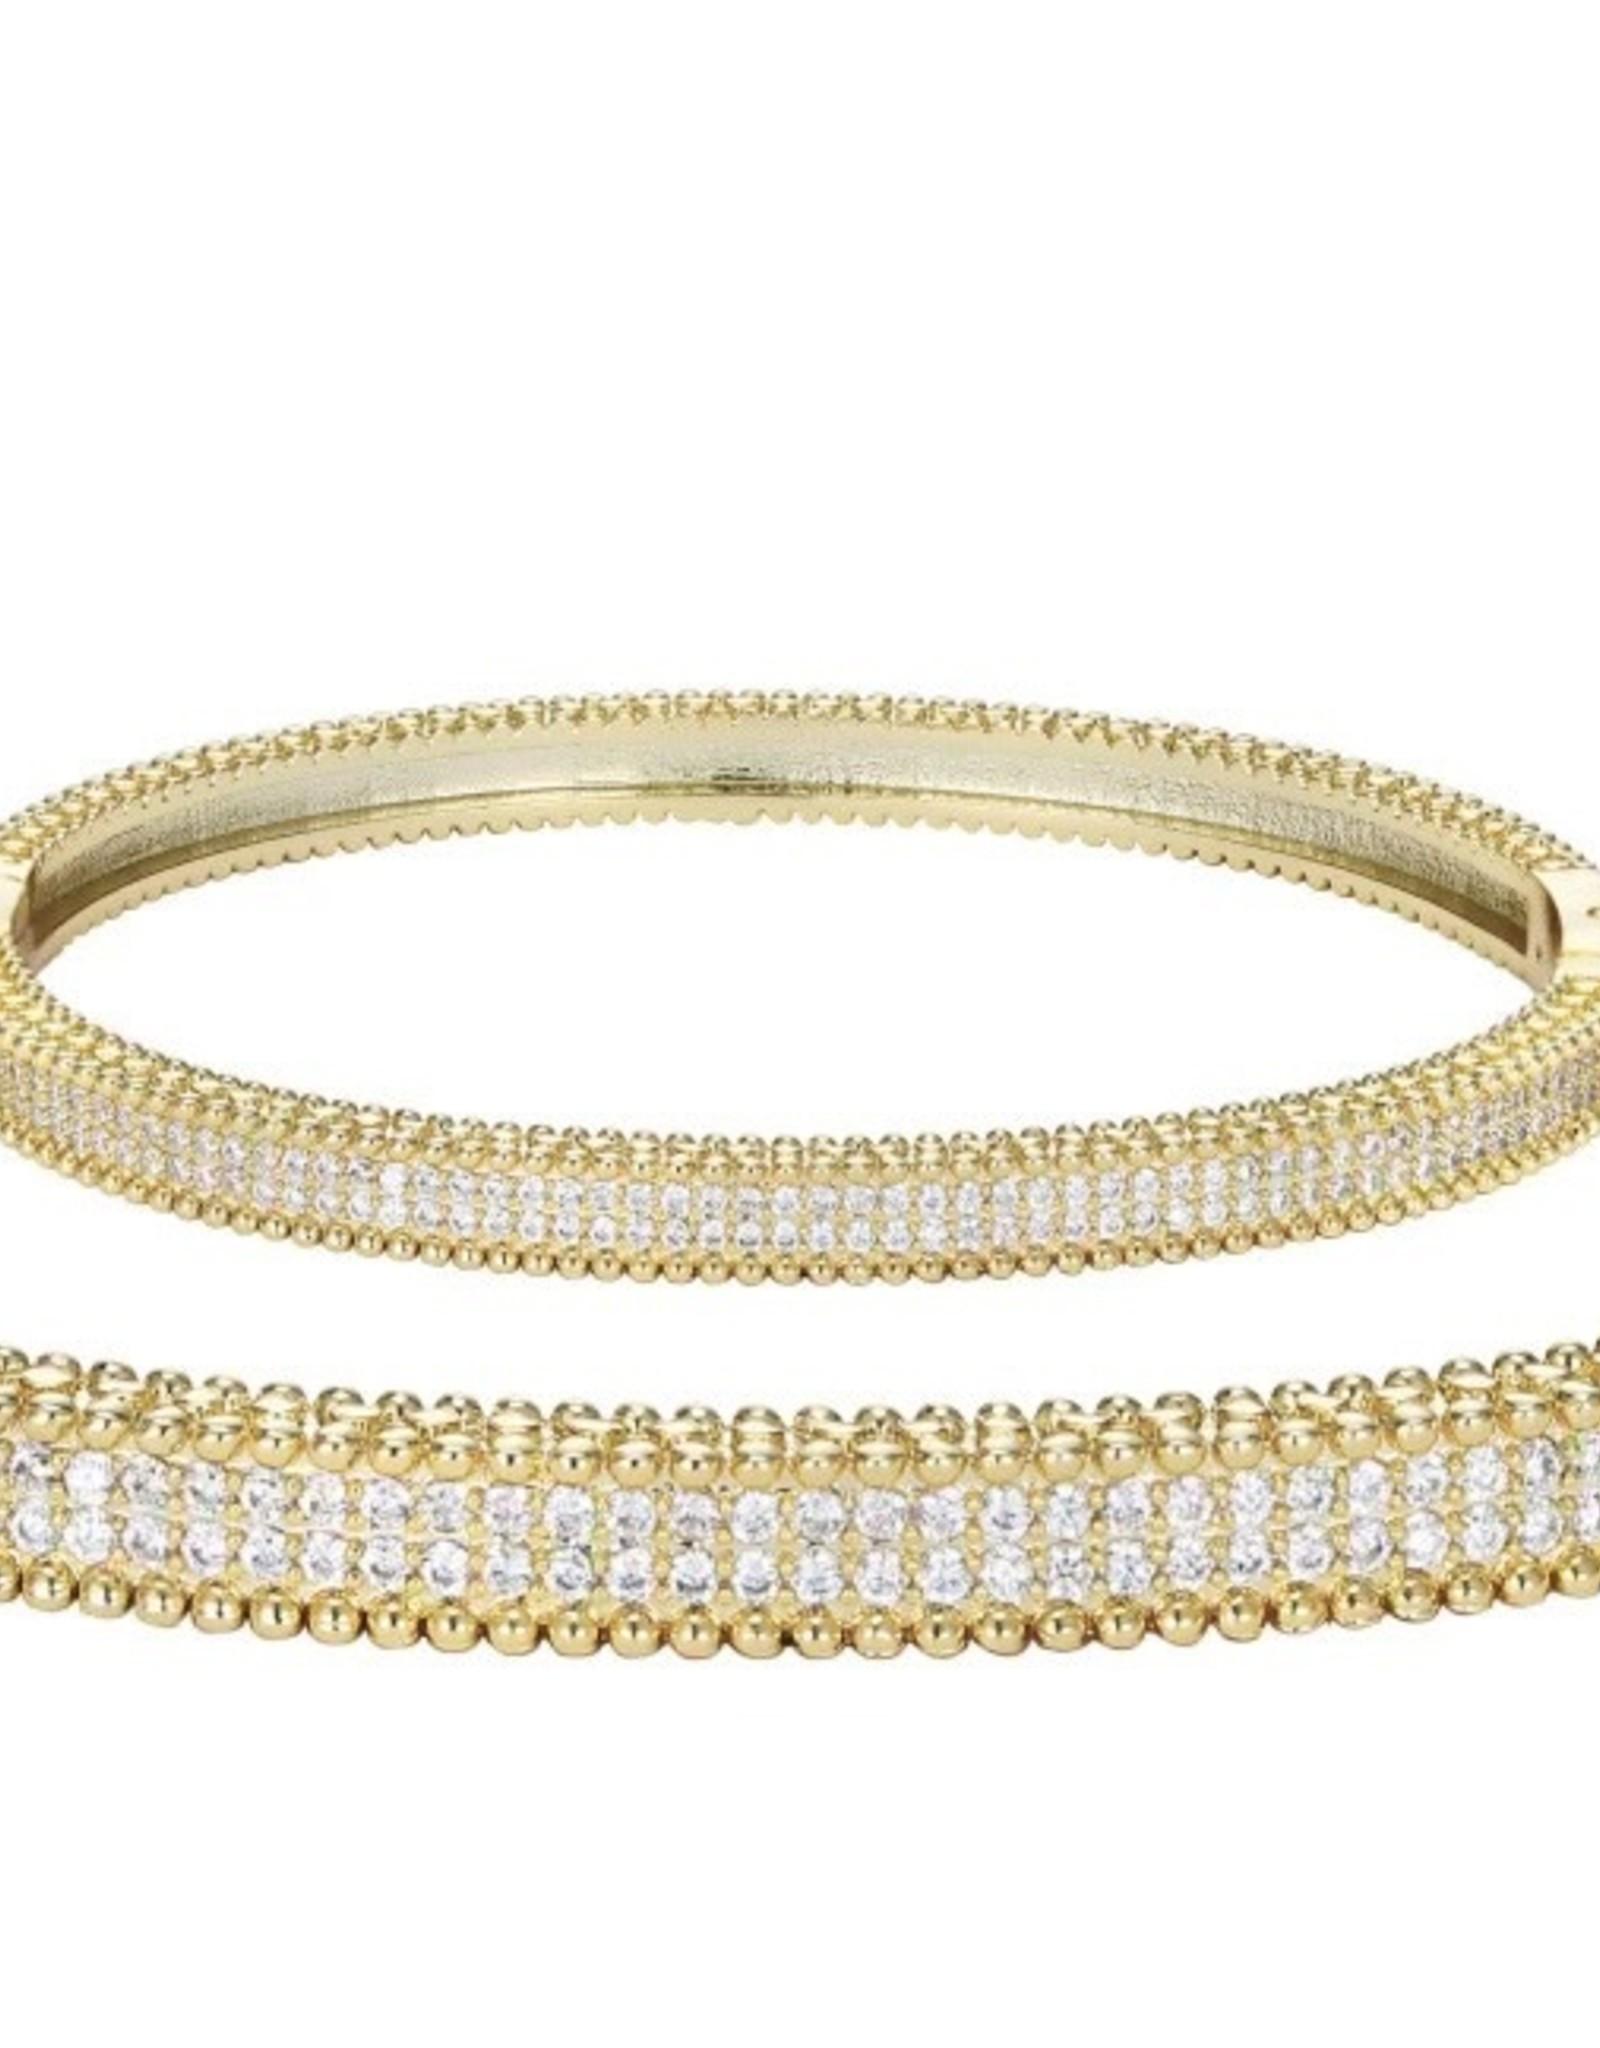 Gold Pave Set Clasp closure Bangle Bracelet